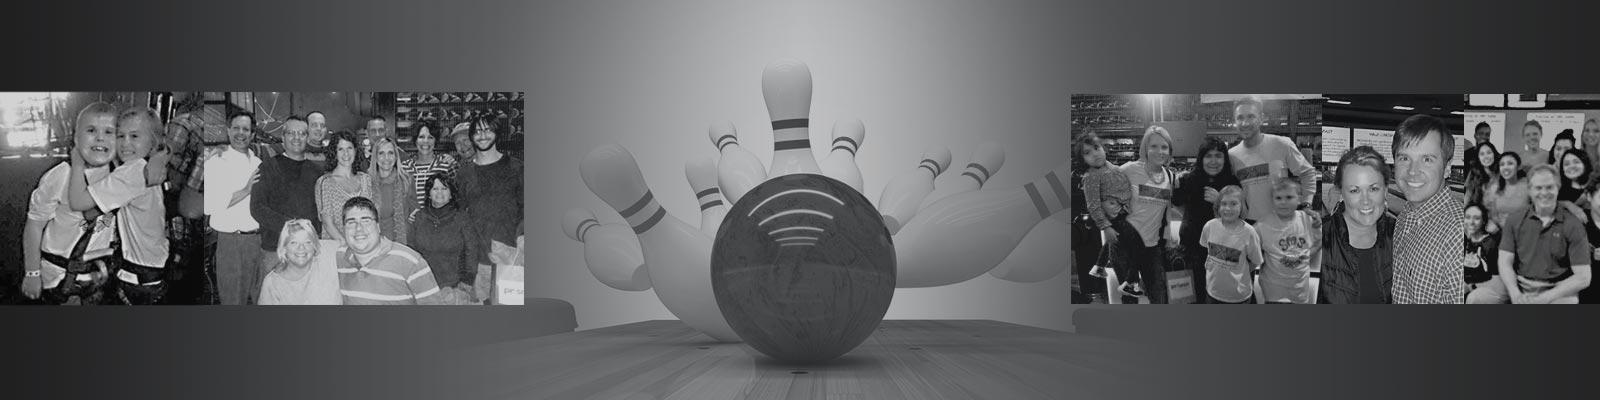 bowling-sms-header.jpg